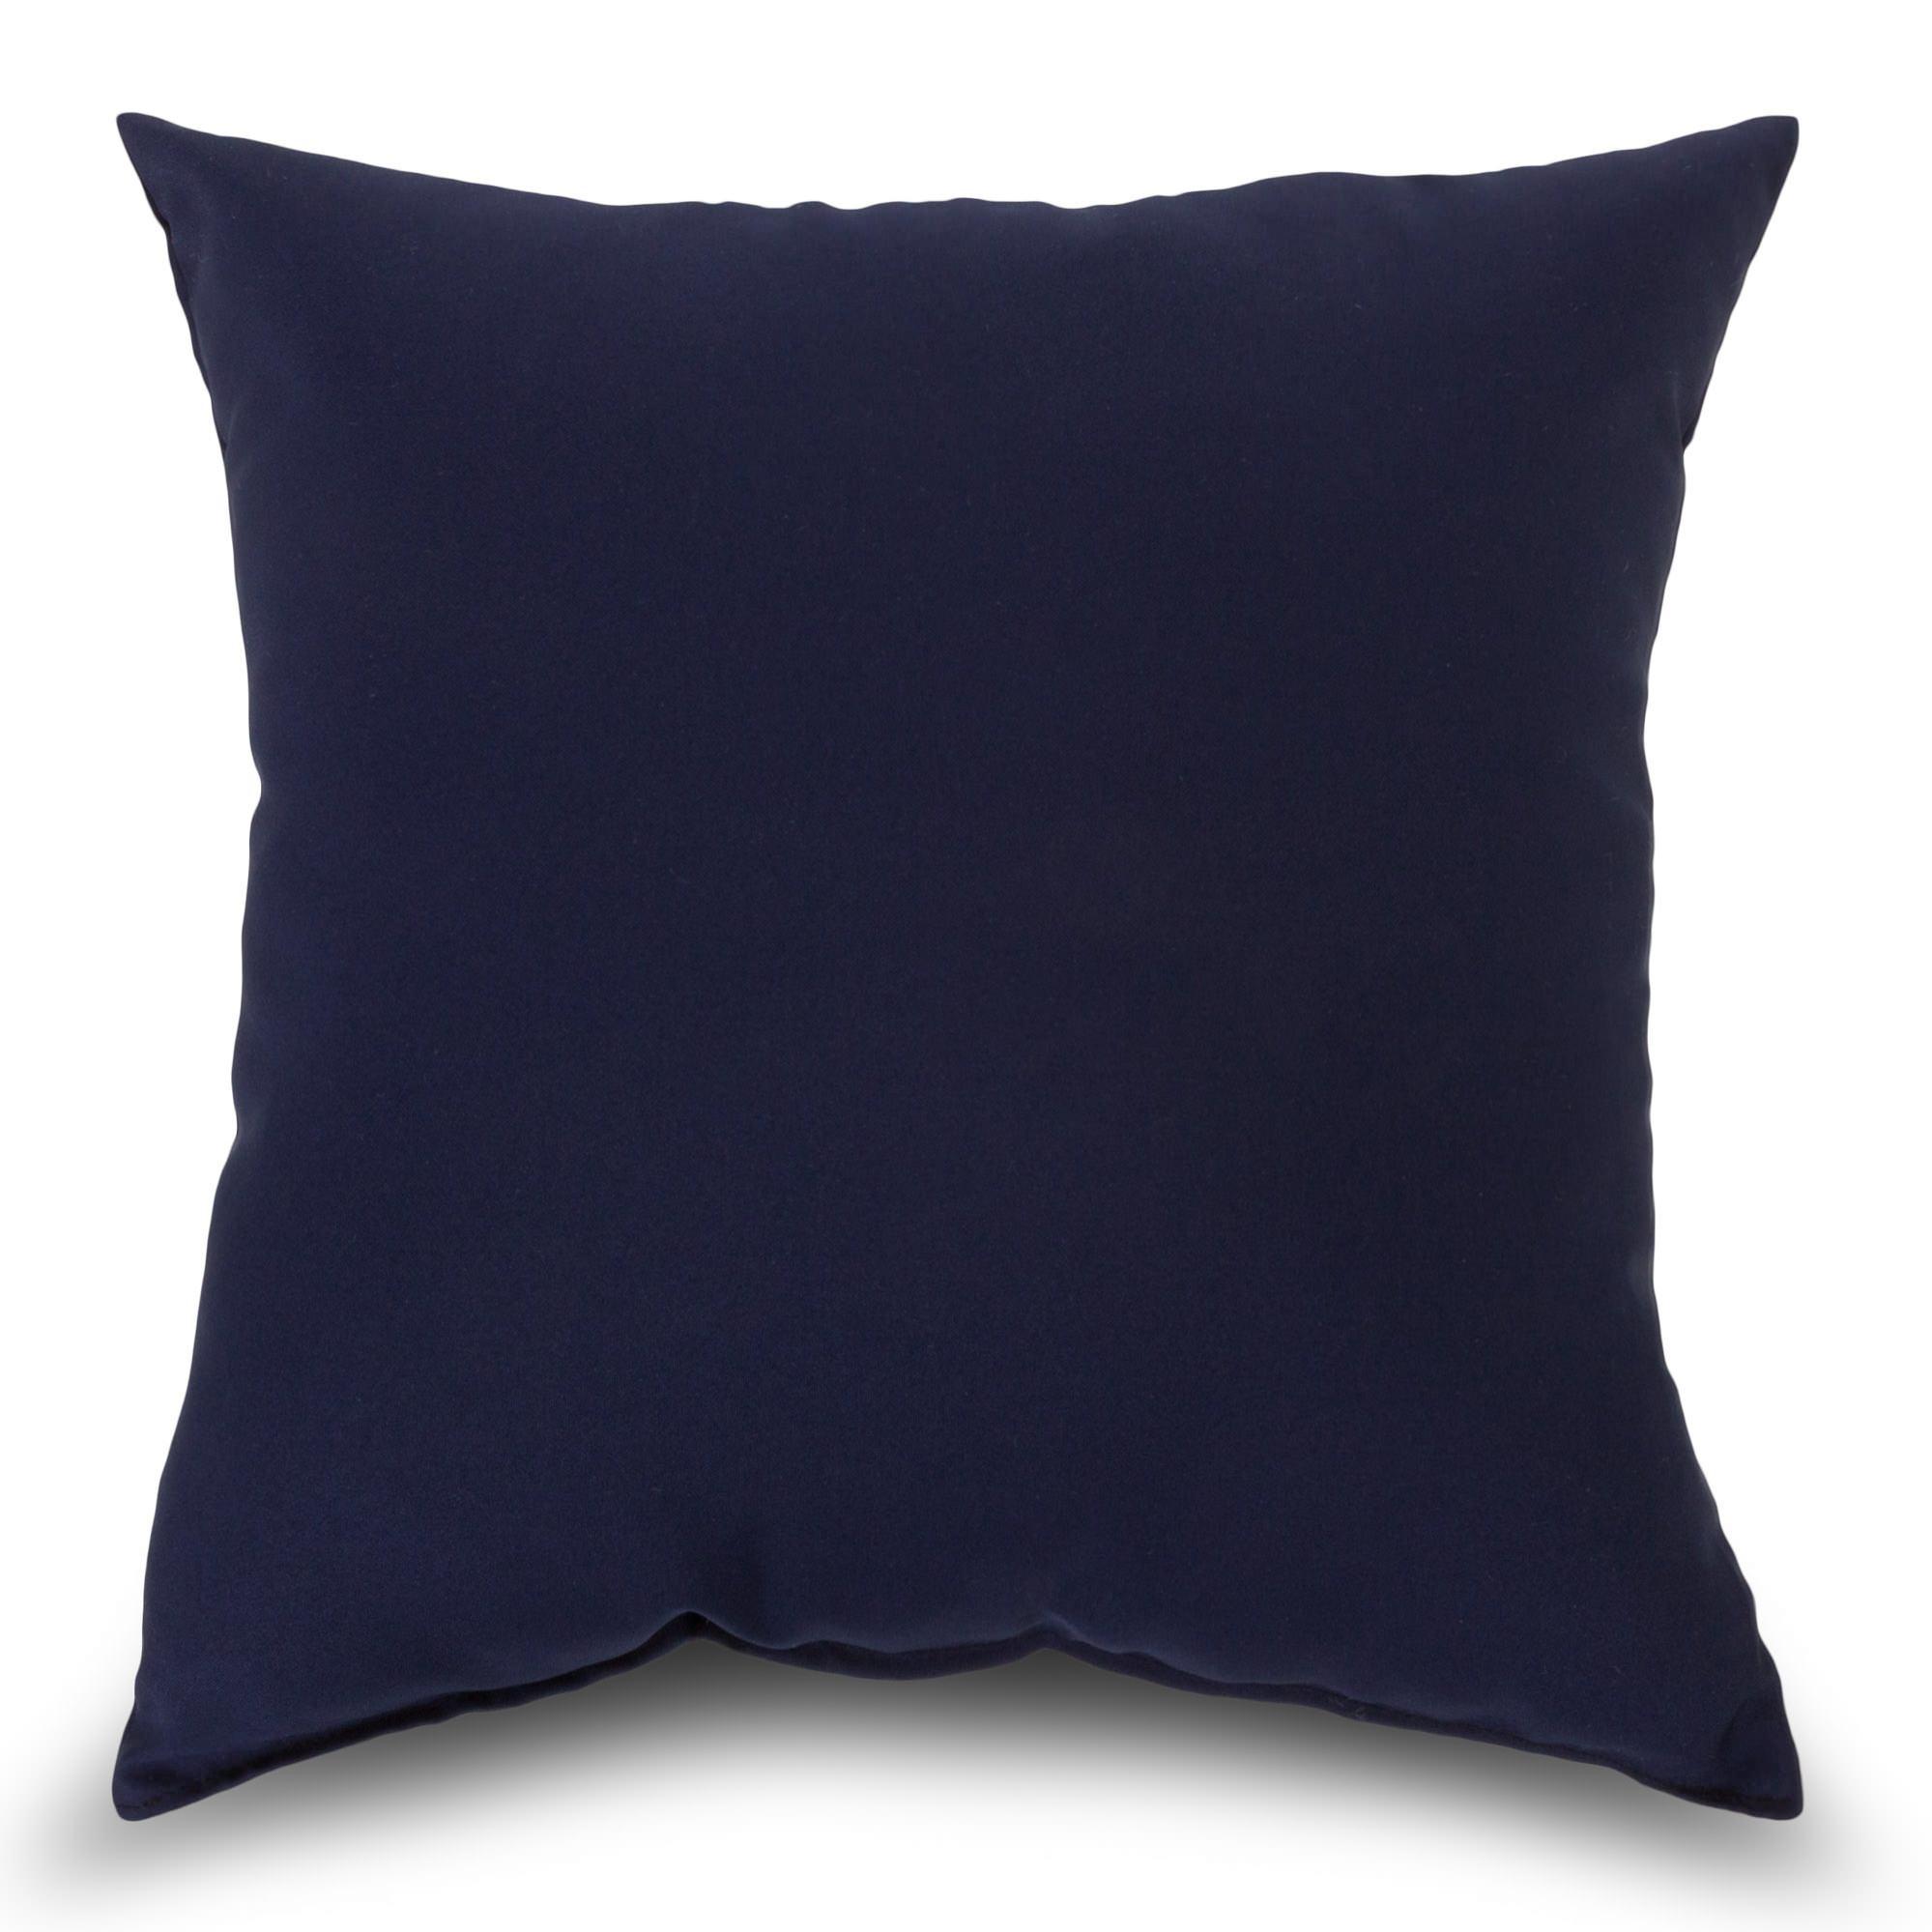 Navy Outdoor Throw Pillow